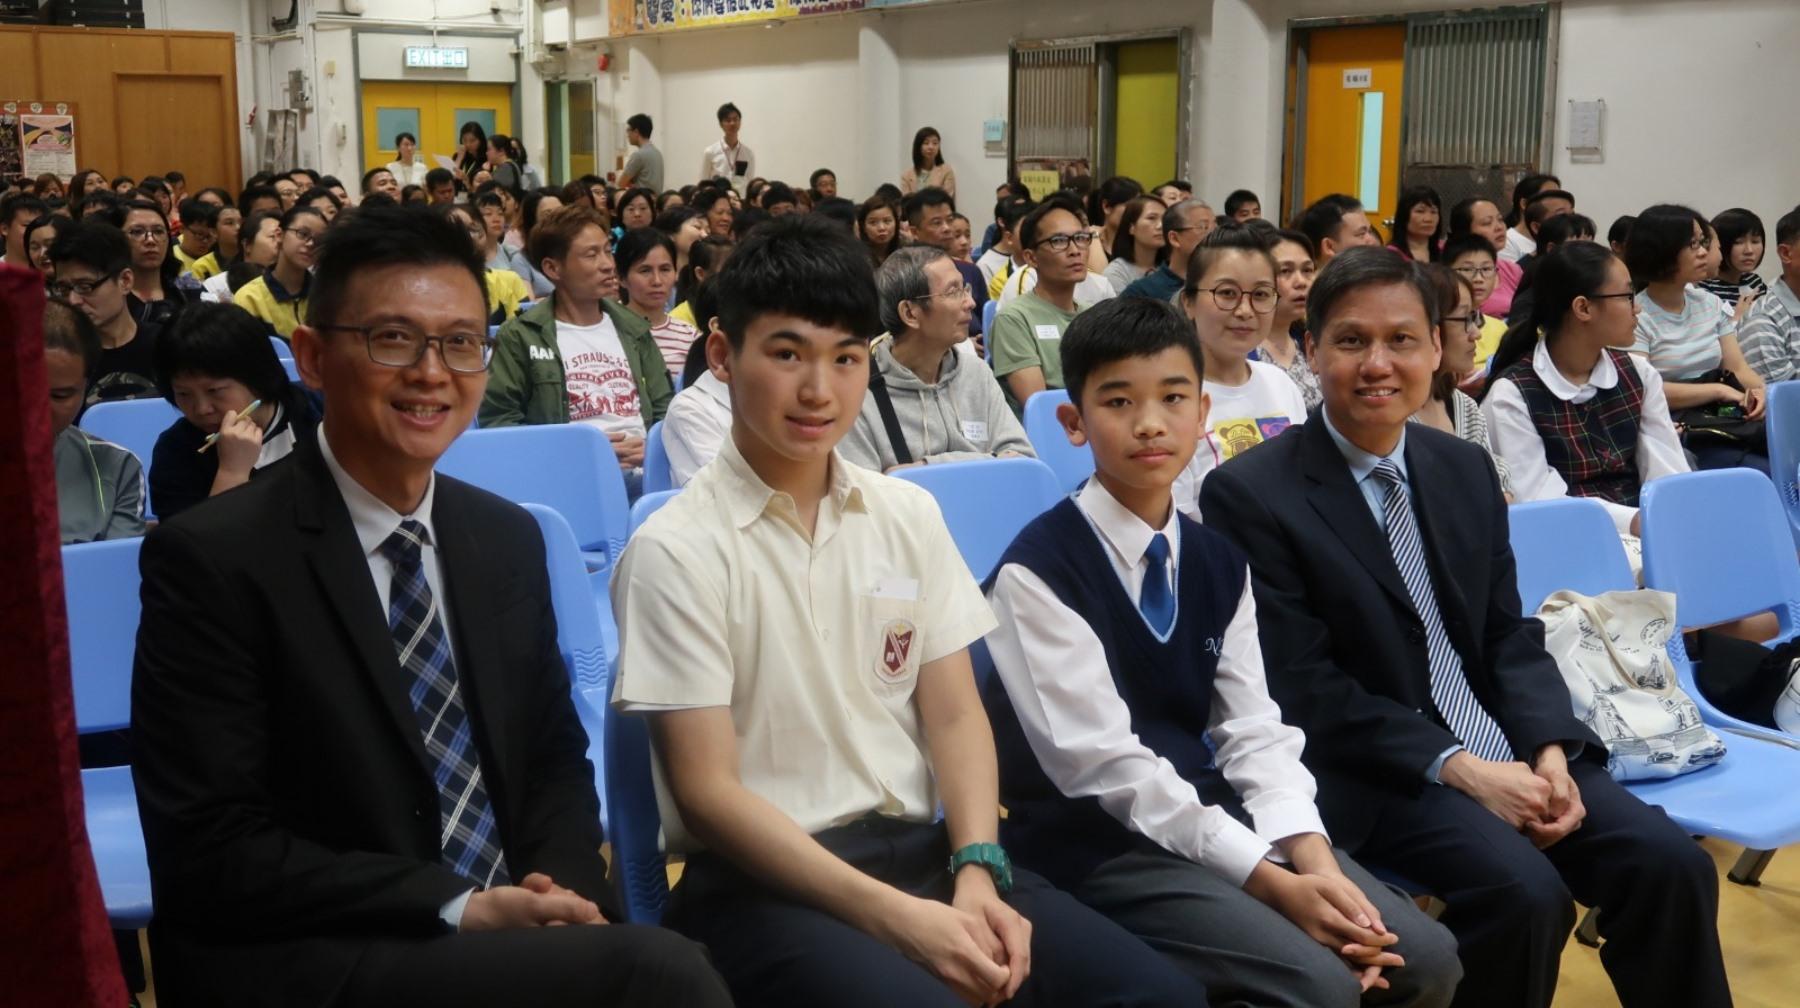 http://npc.edu.hk/sites/default/files/3_1246.jpg